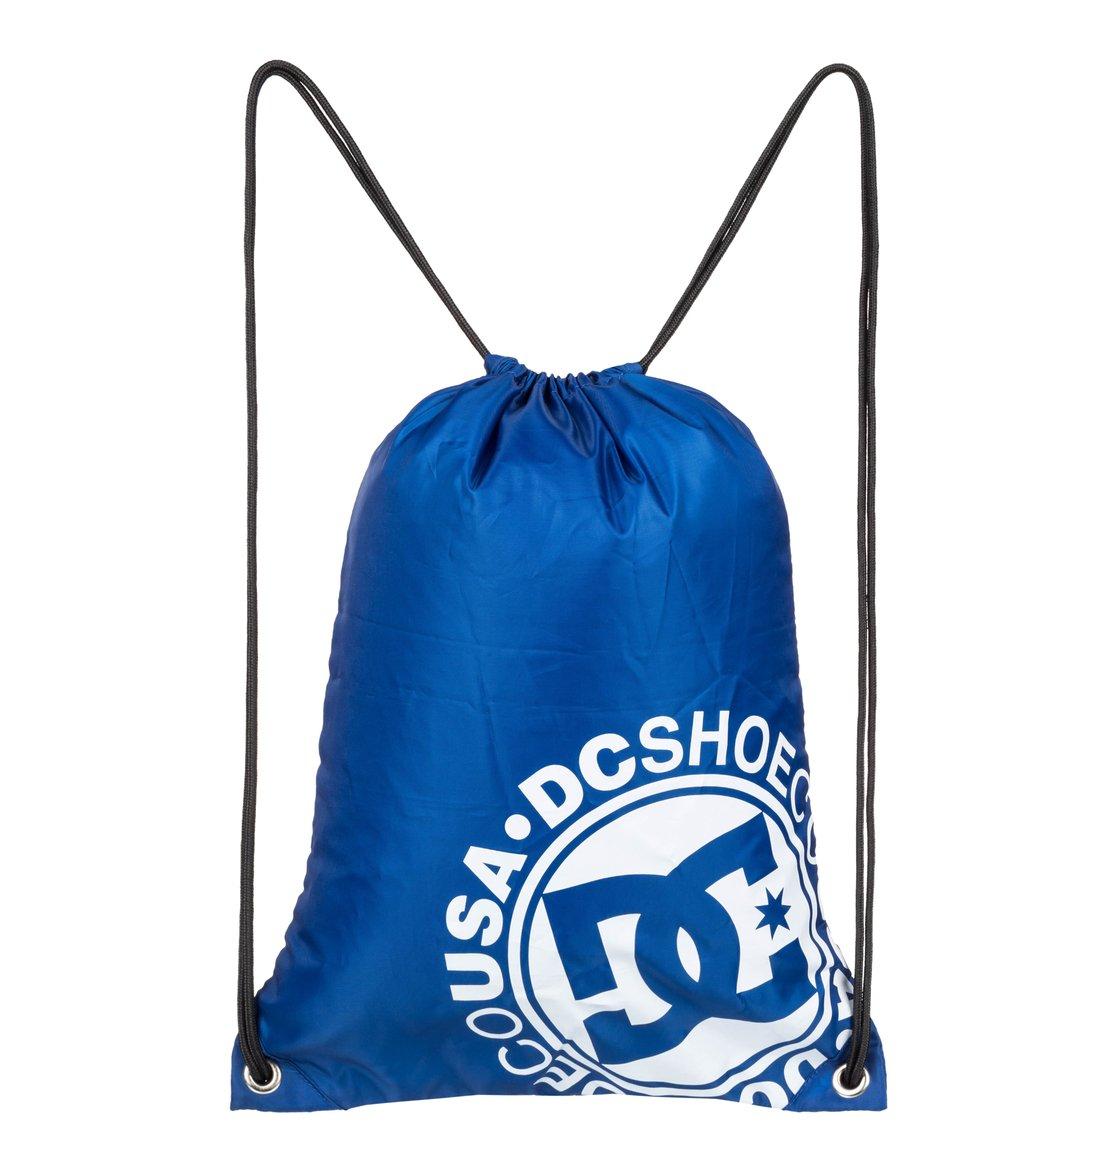 34aaf532cbd7 Cinched Drawstring Bag